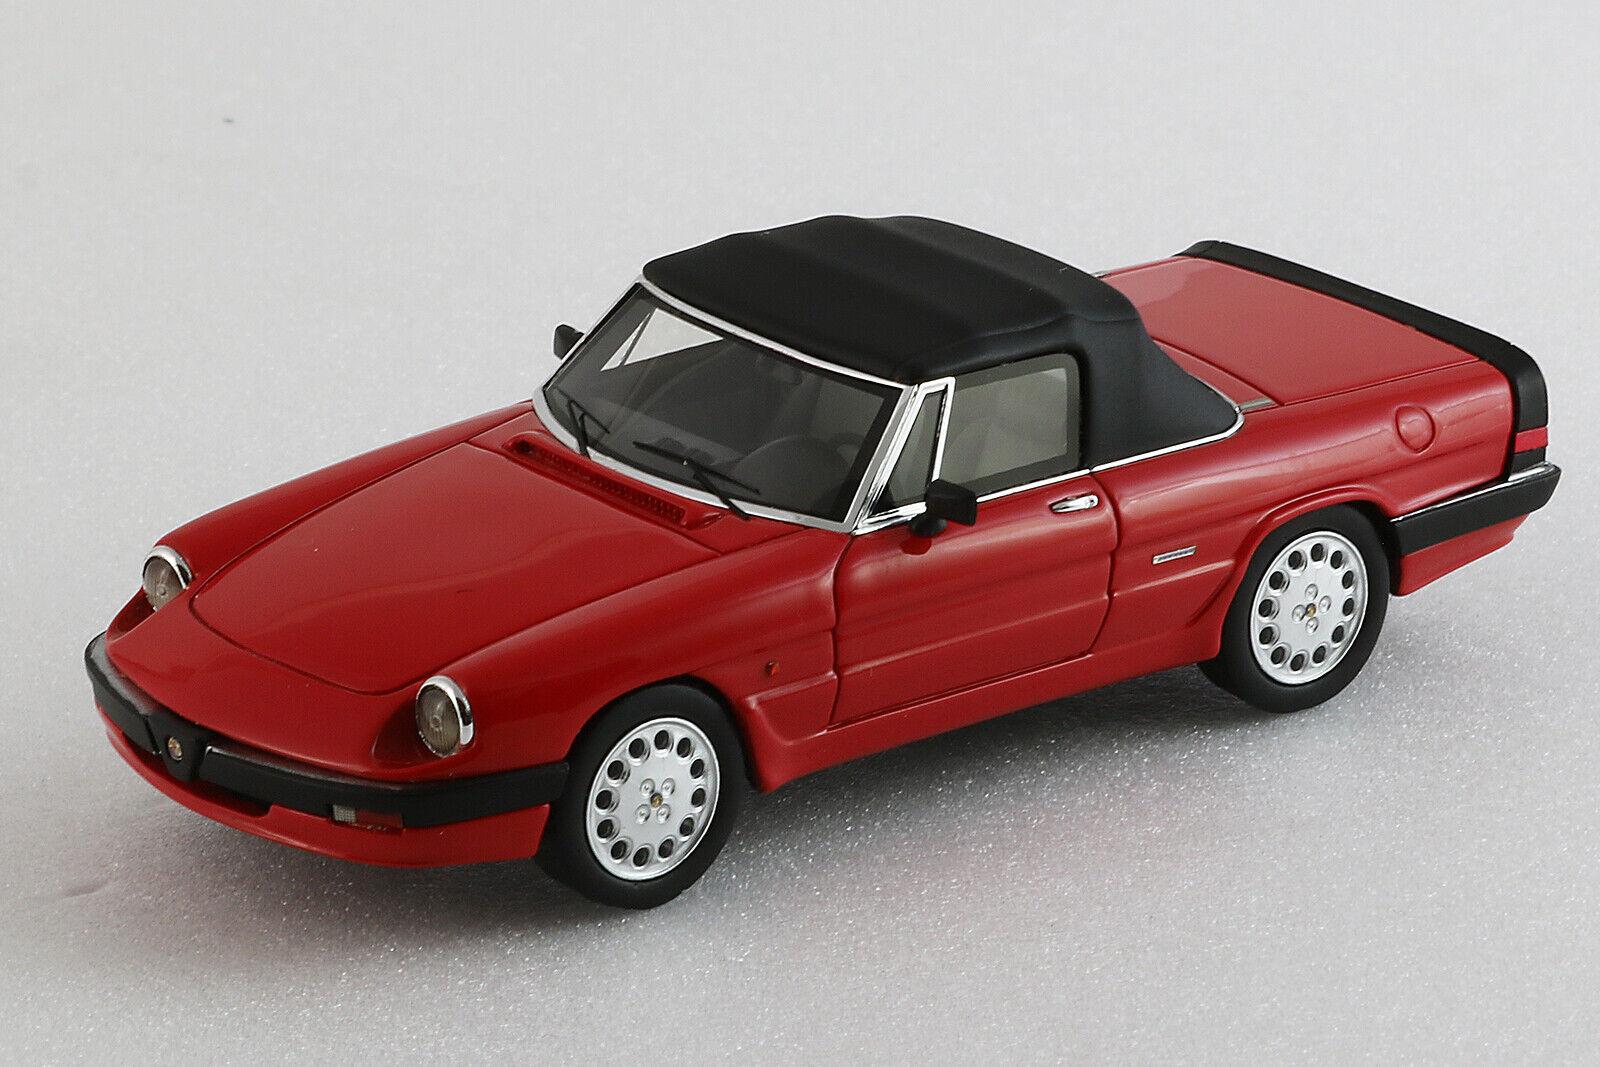 Alfa Romeo Spider 1986 3a serie Closed - 1 43ème - Rouge - Milena Rose